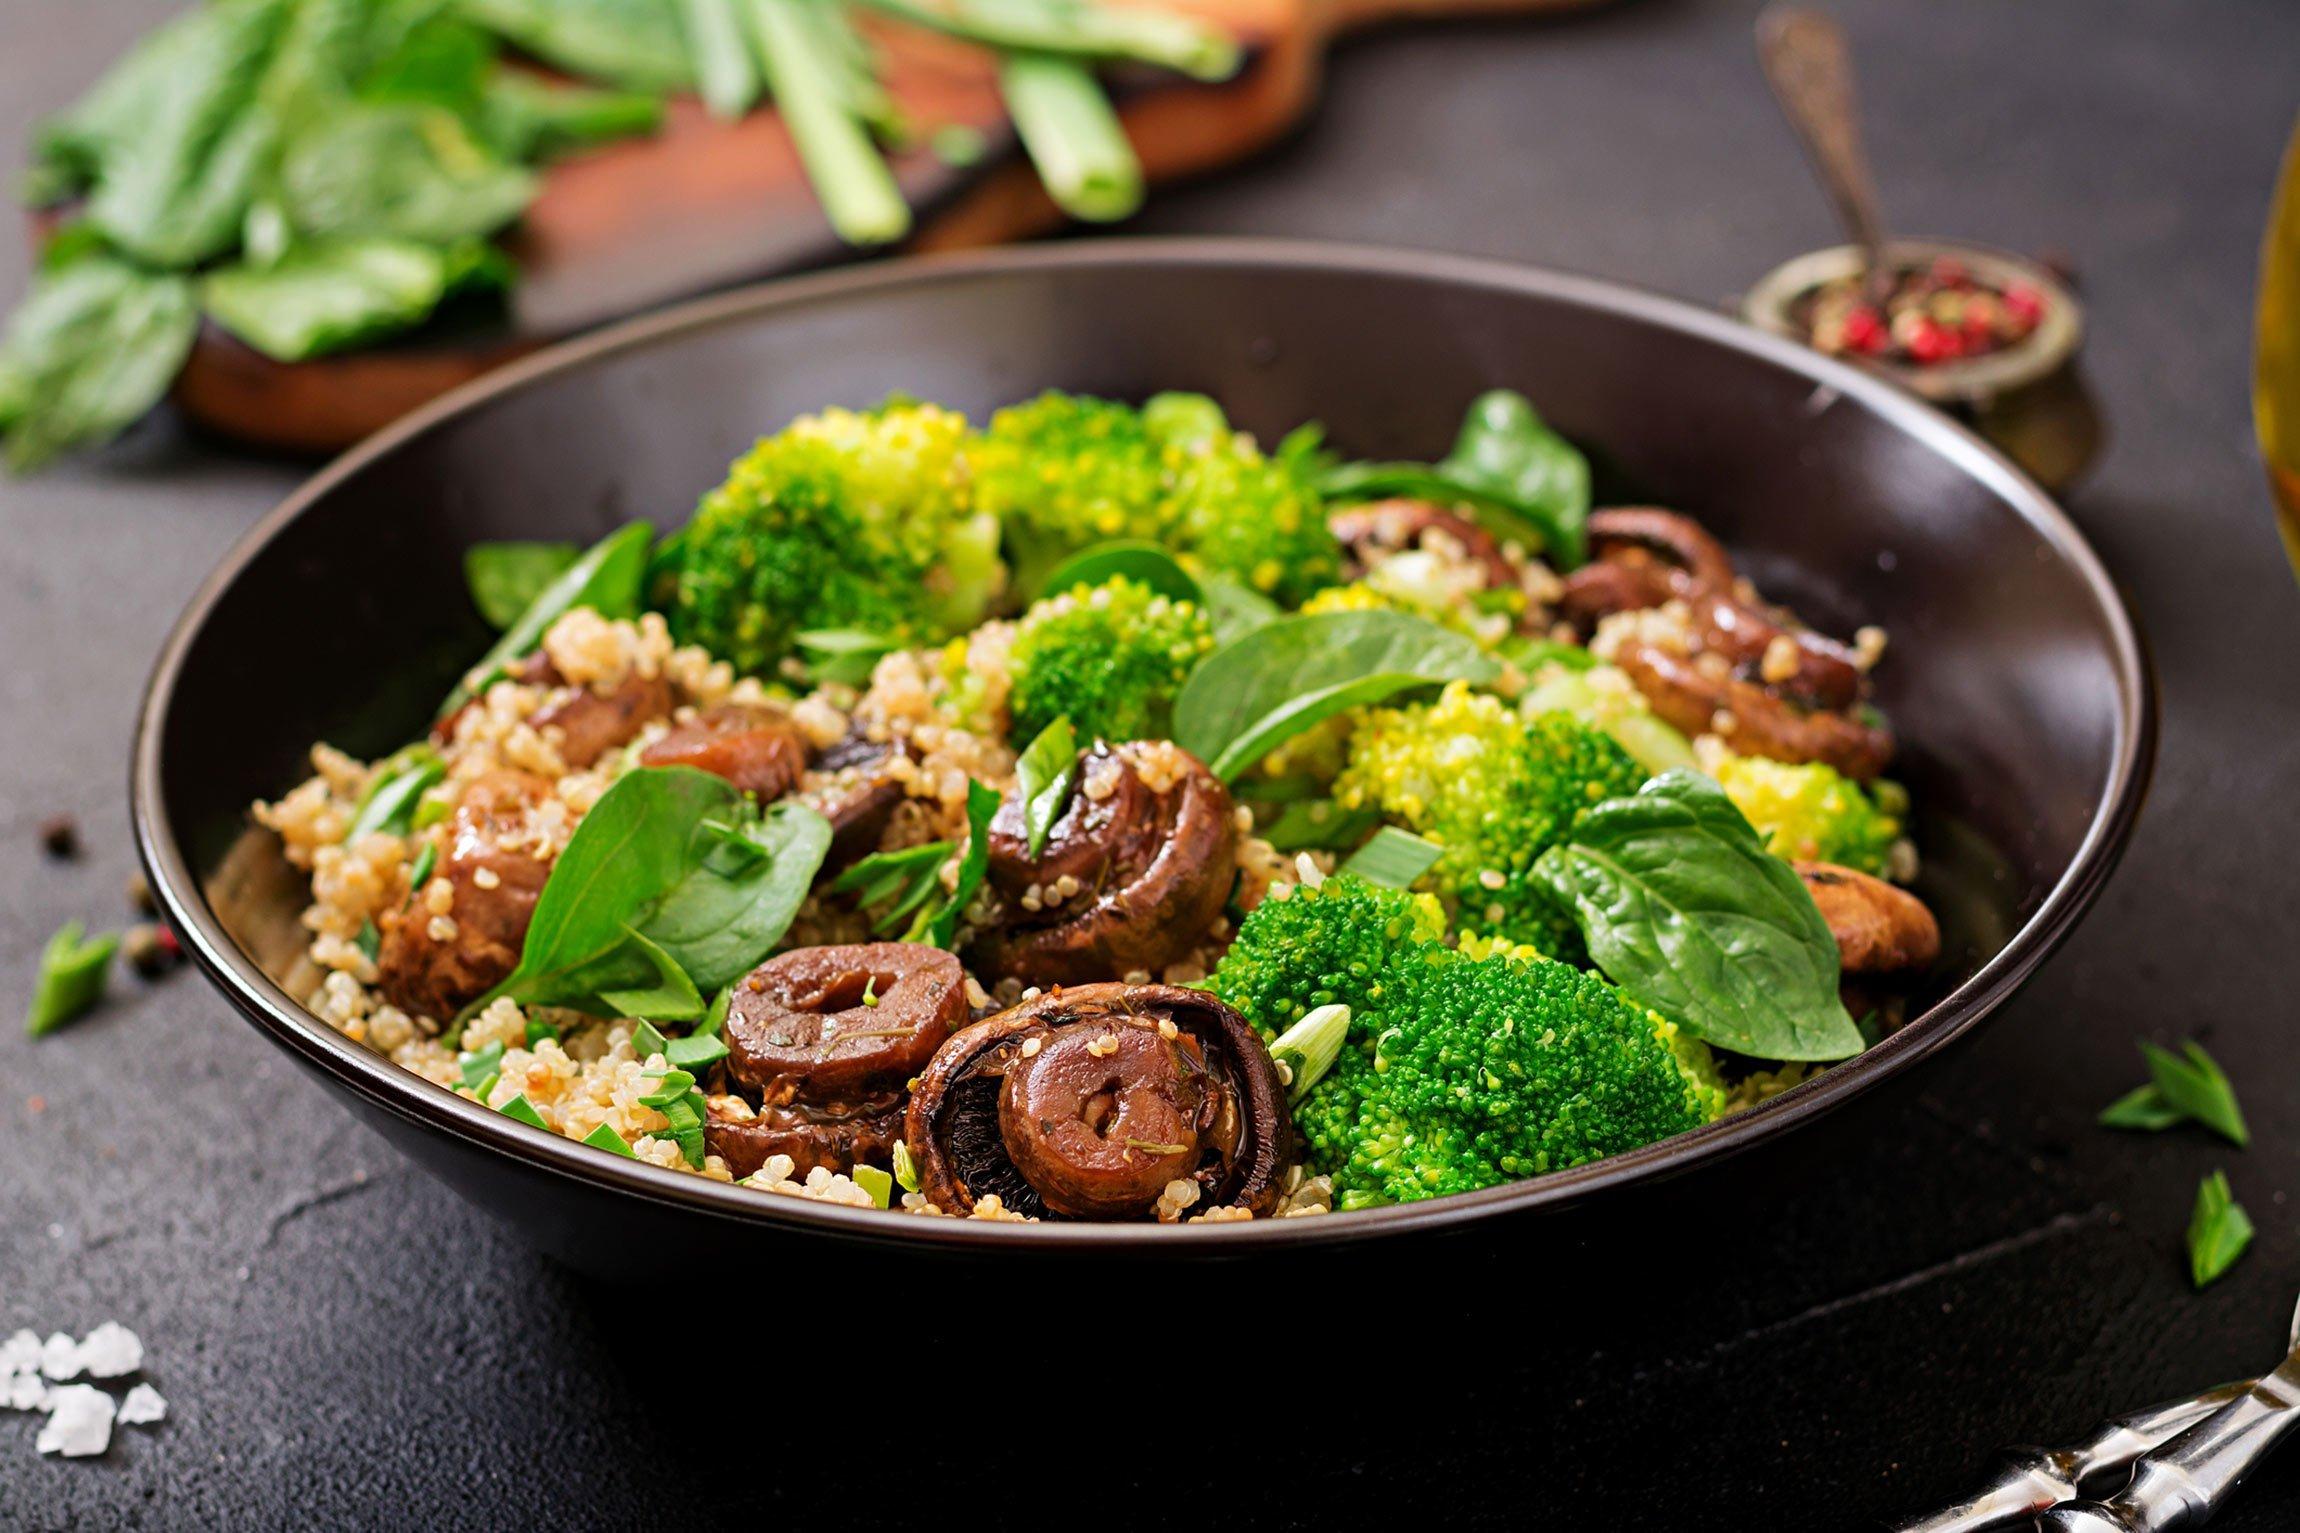 broccoli and mushrooms stir fry